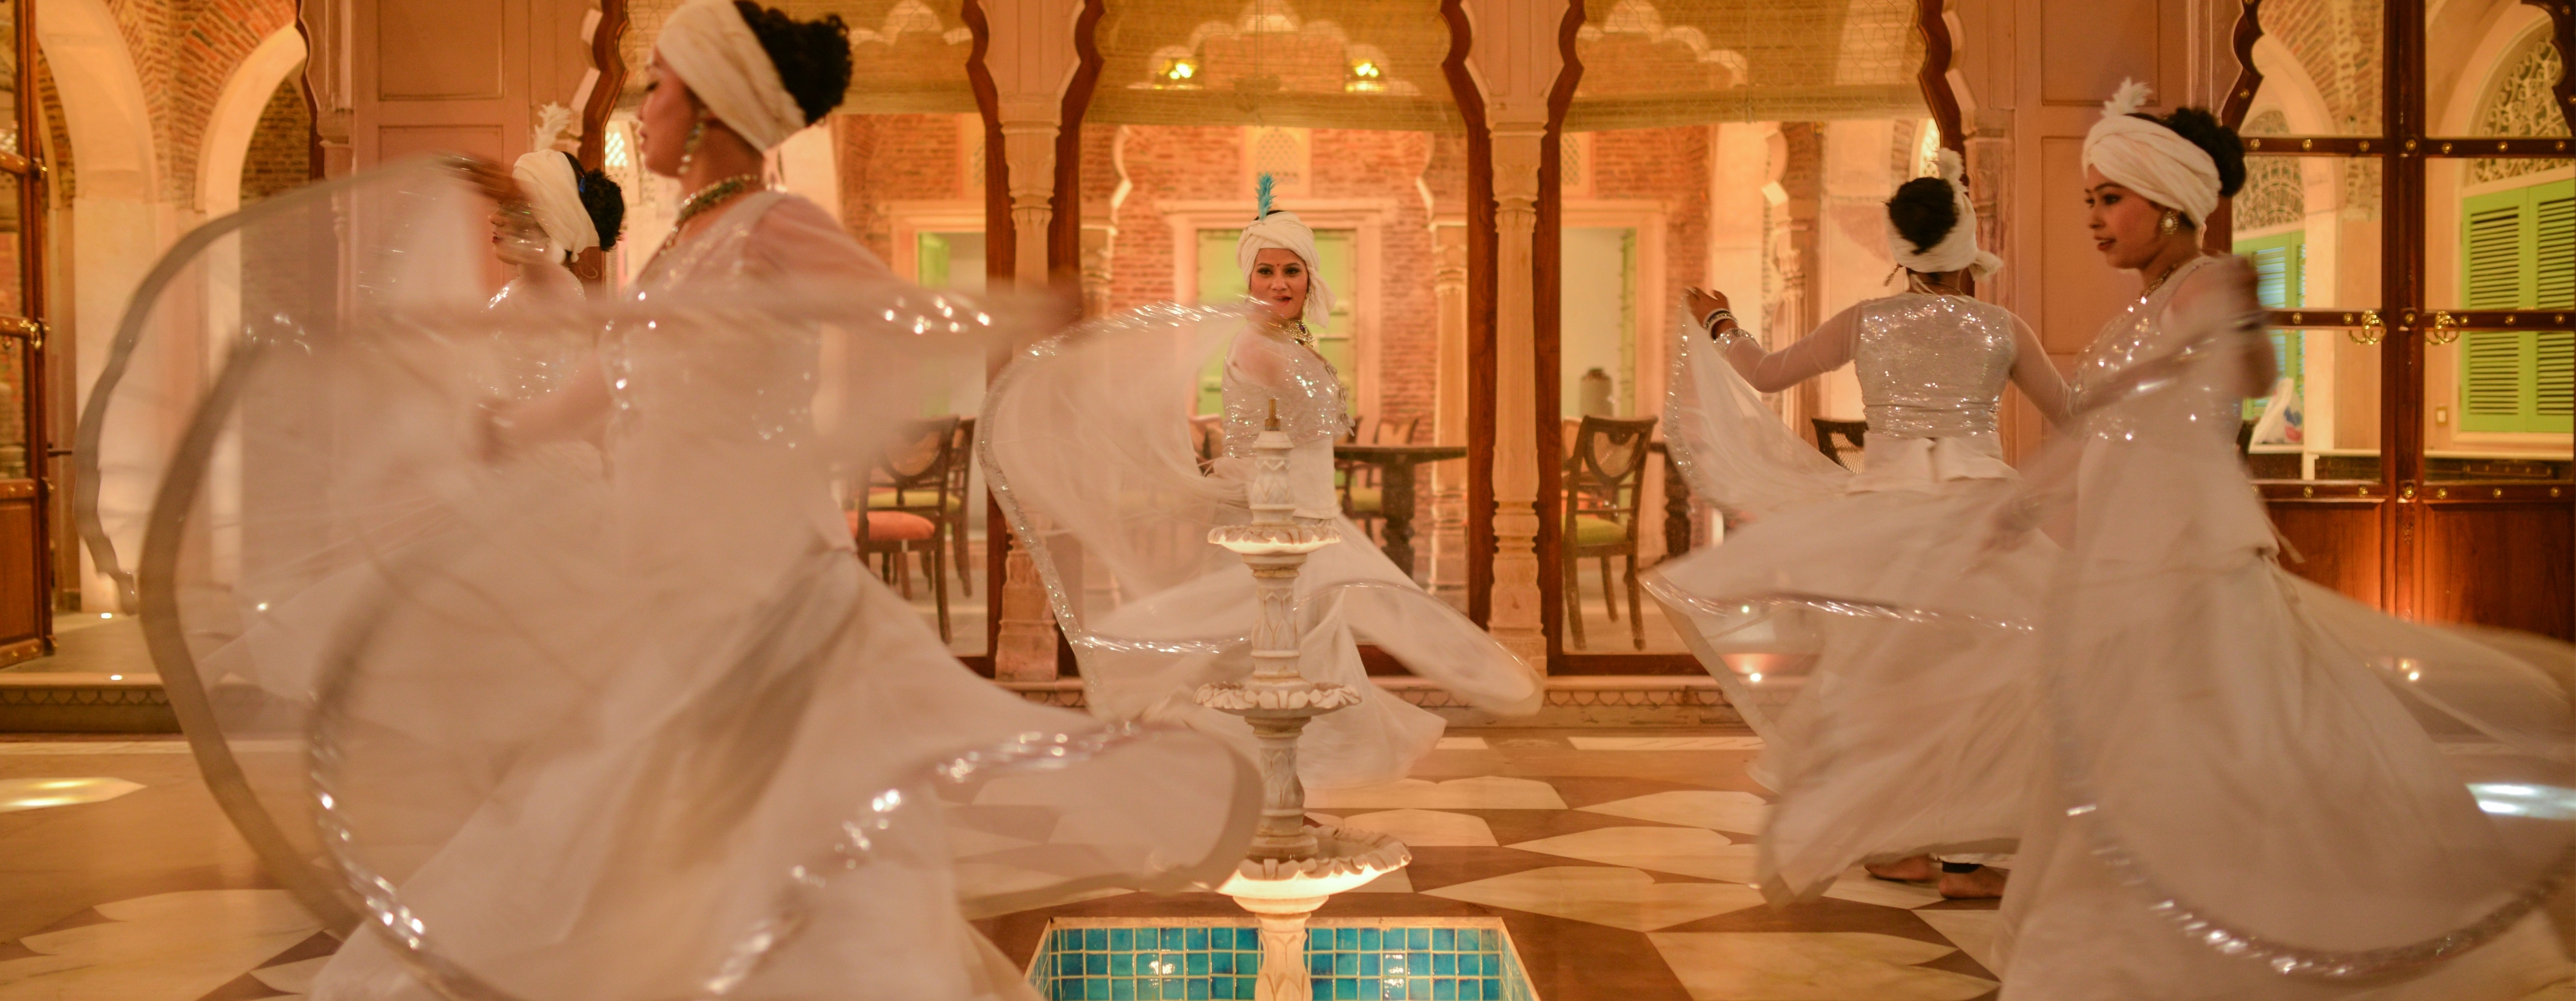 Kathak-dancers-delhi-india